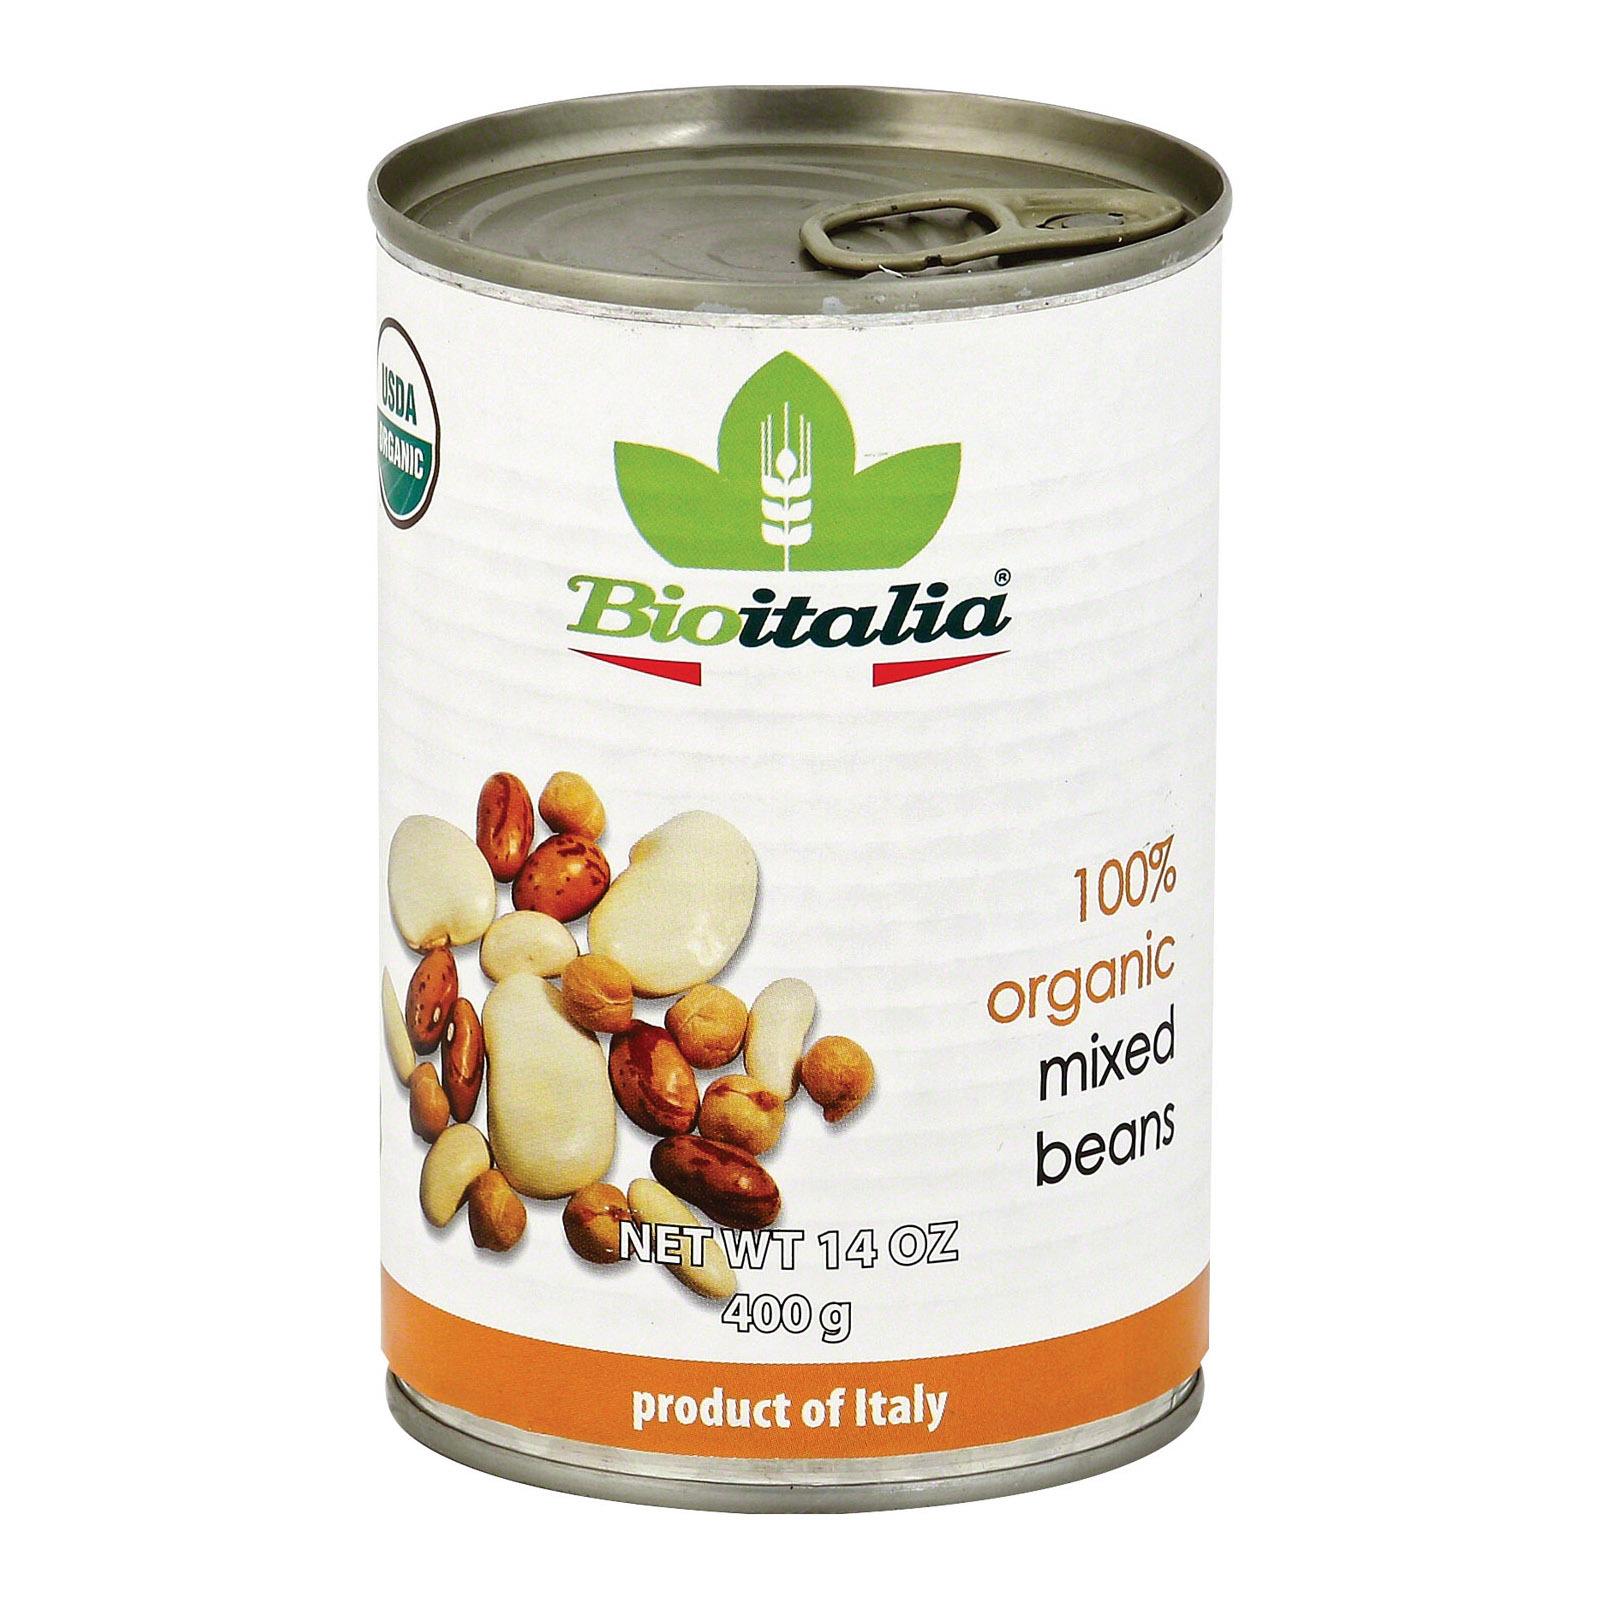 Bioitalia Beans - Mixed Beans - Case of 12 - 14 oz.